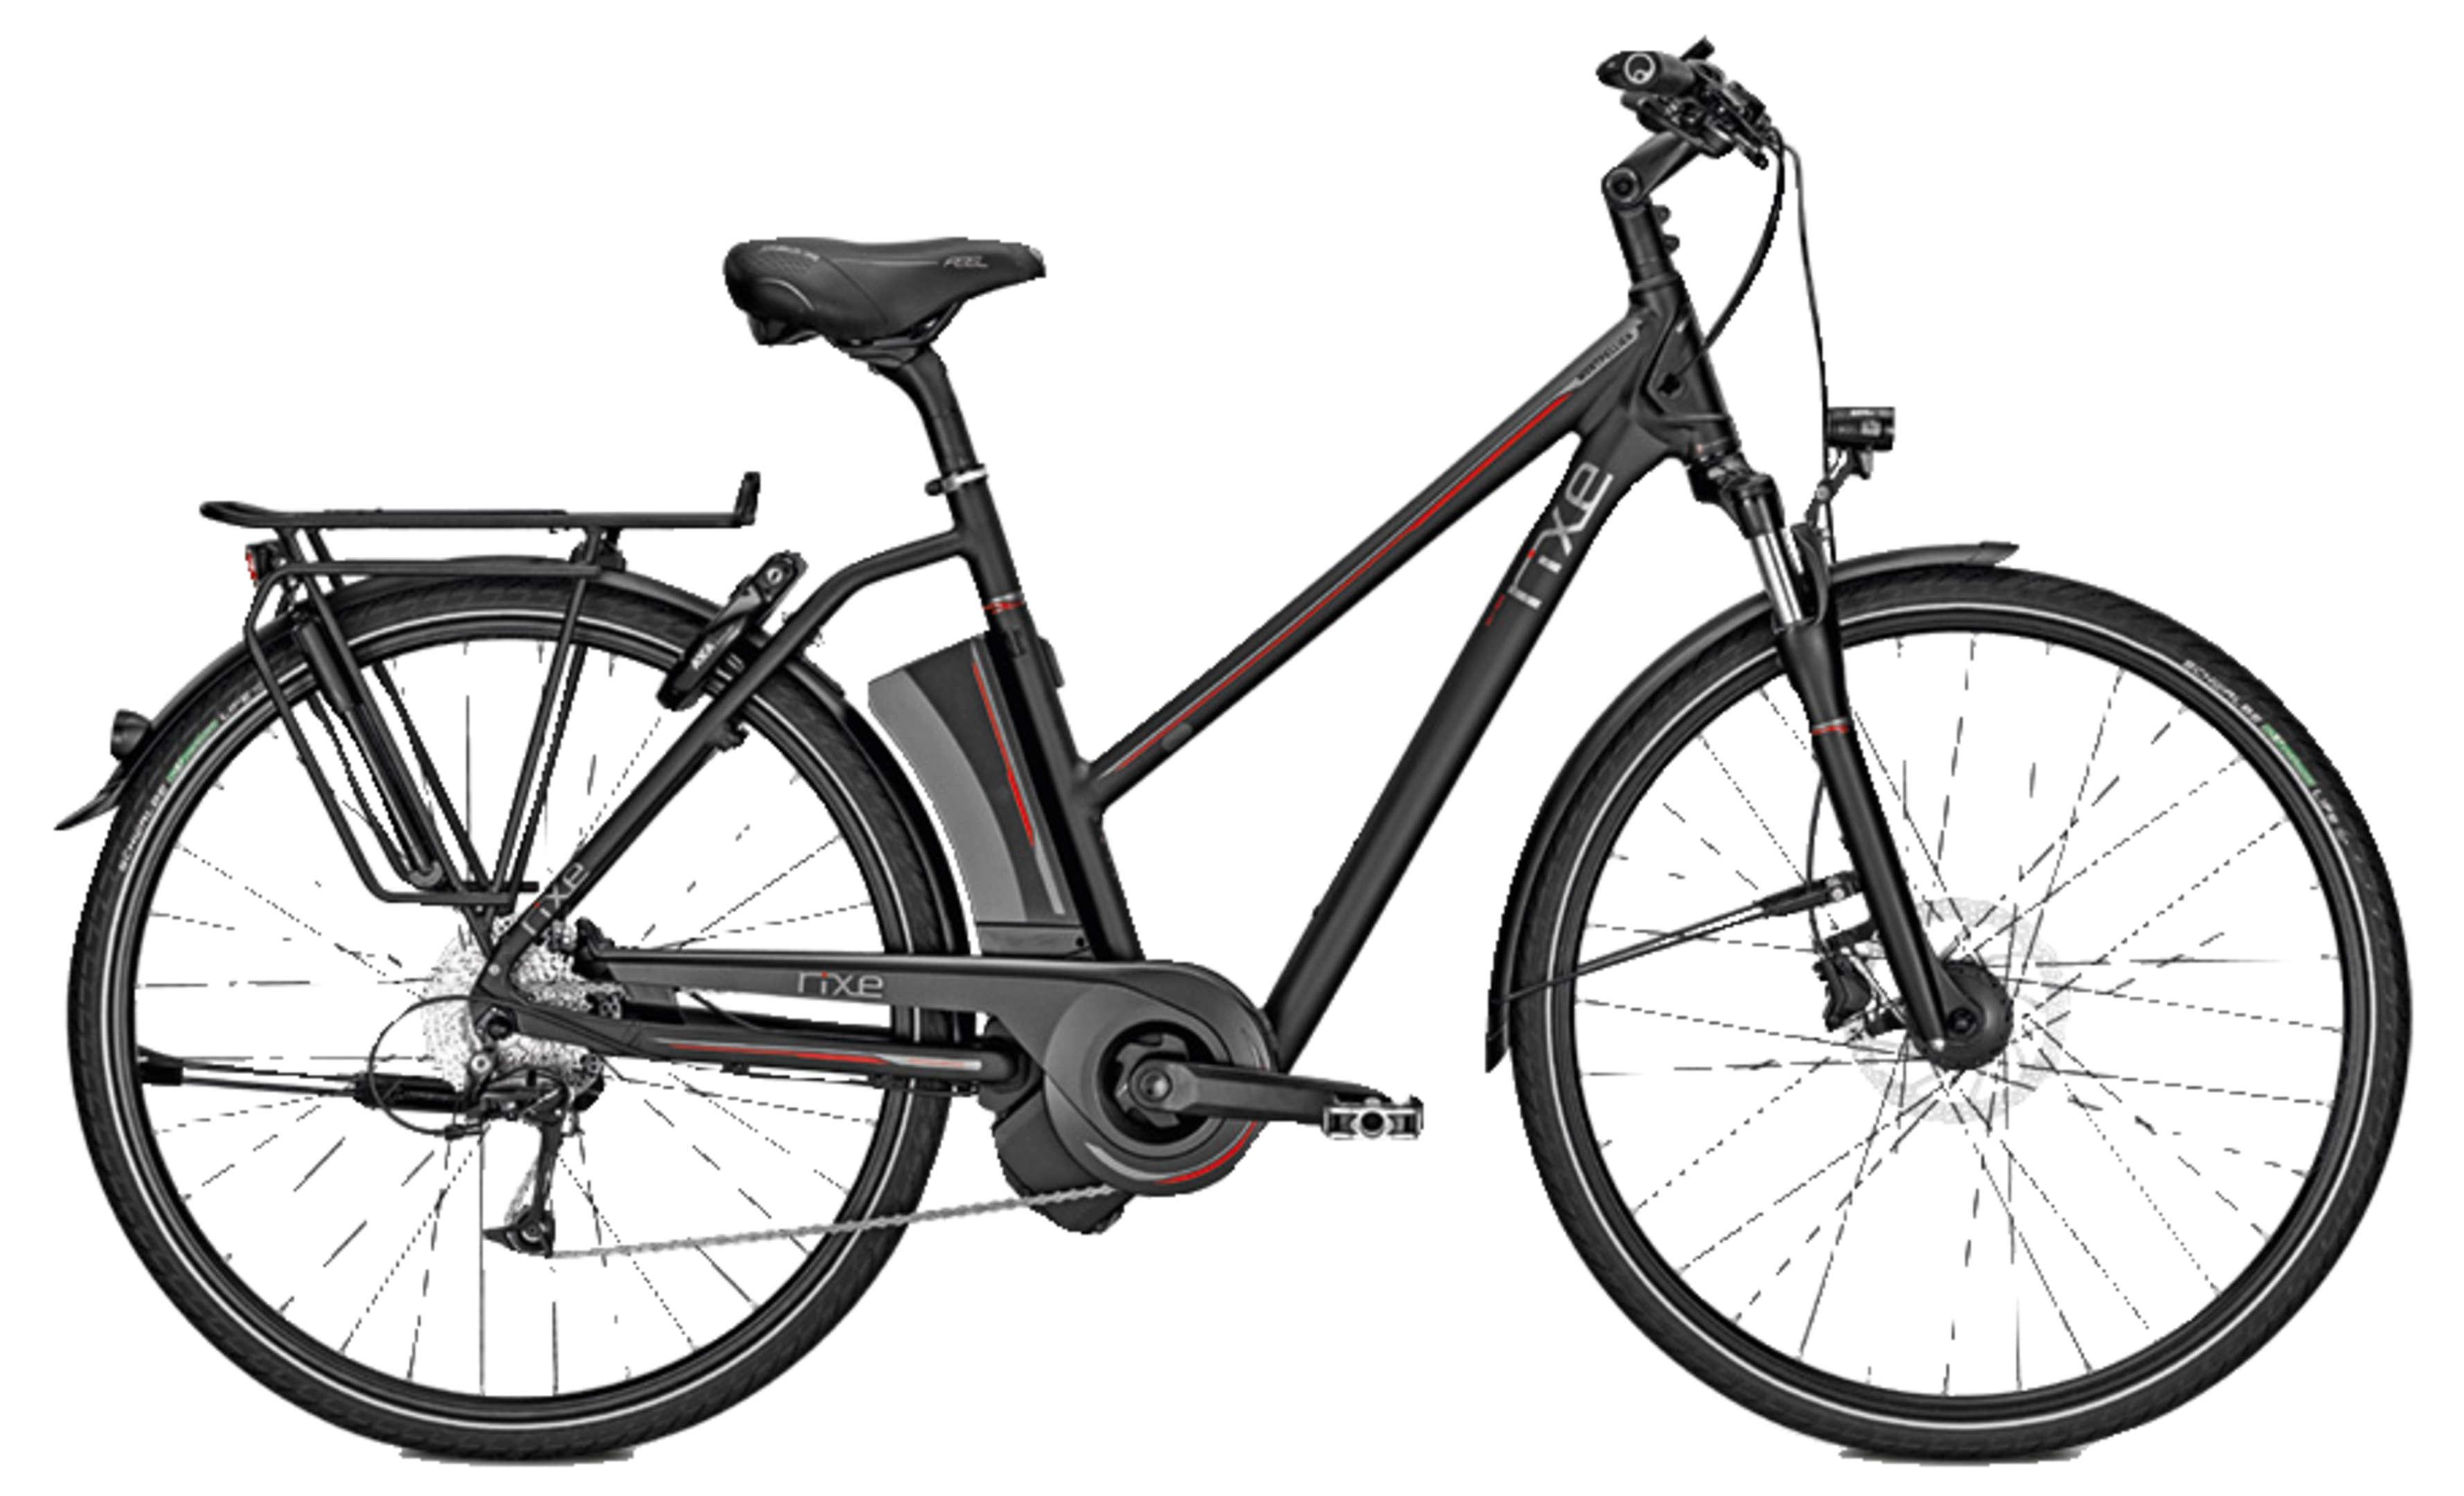 rixe e bike montpellier i9 eurorad bikeleasingeurorad. Black Bedroom Furniture Sets. Home Design Ideas